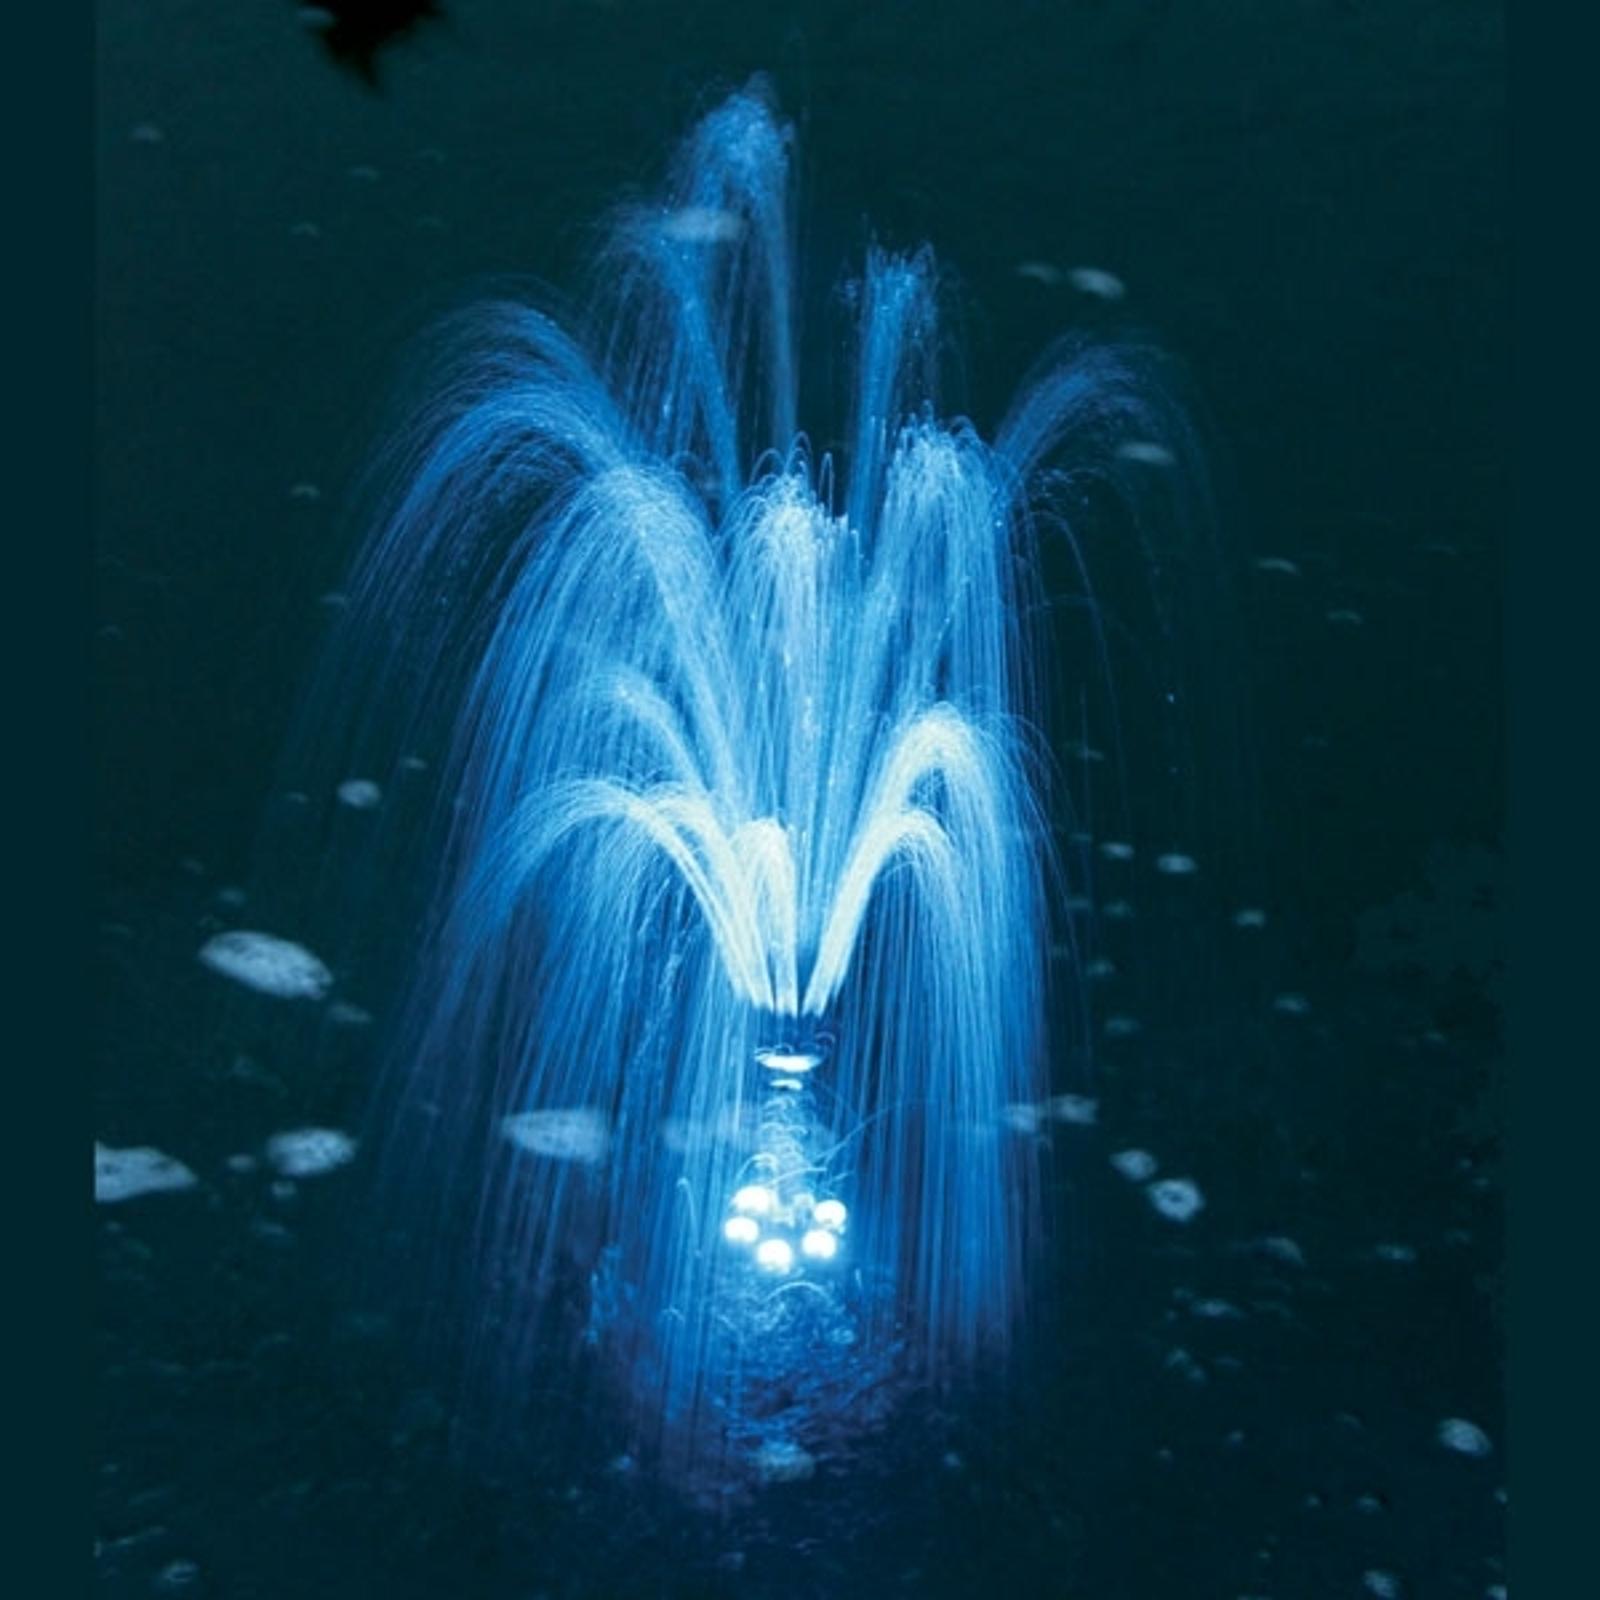 LED light ring for Napoli / Siena pond pumps blue_3012116_1